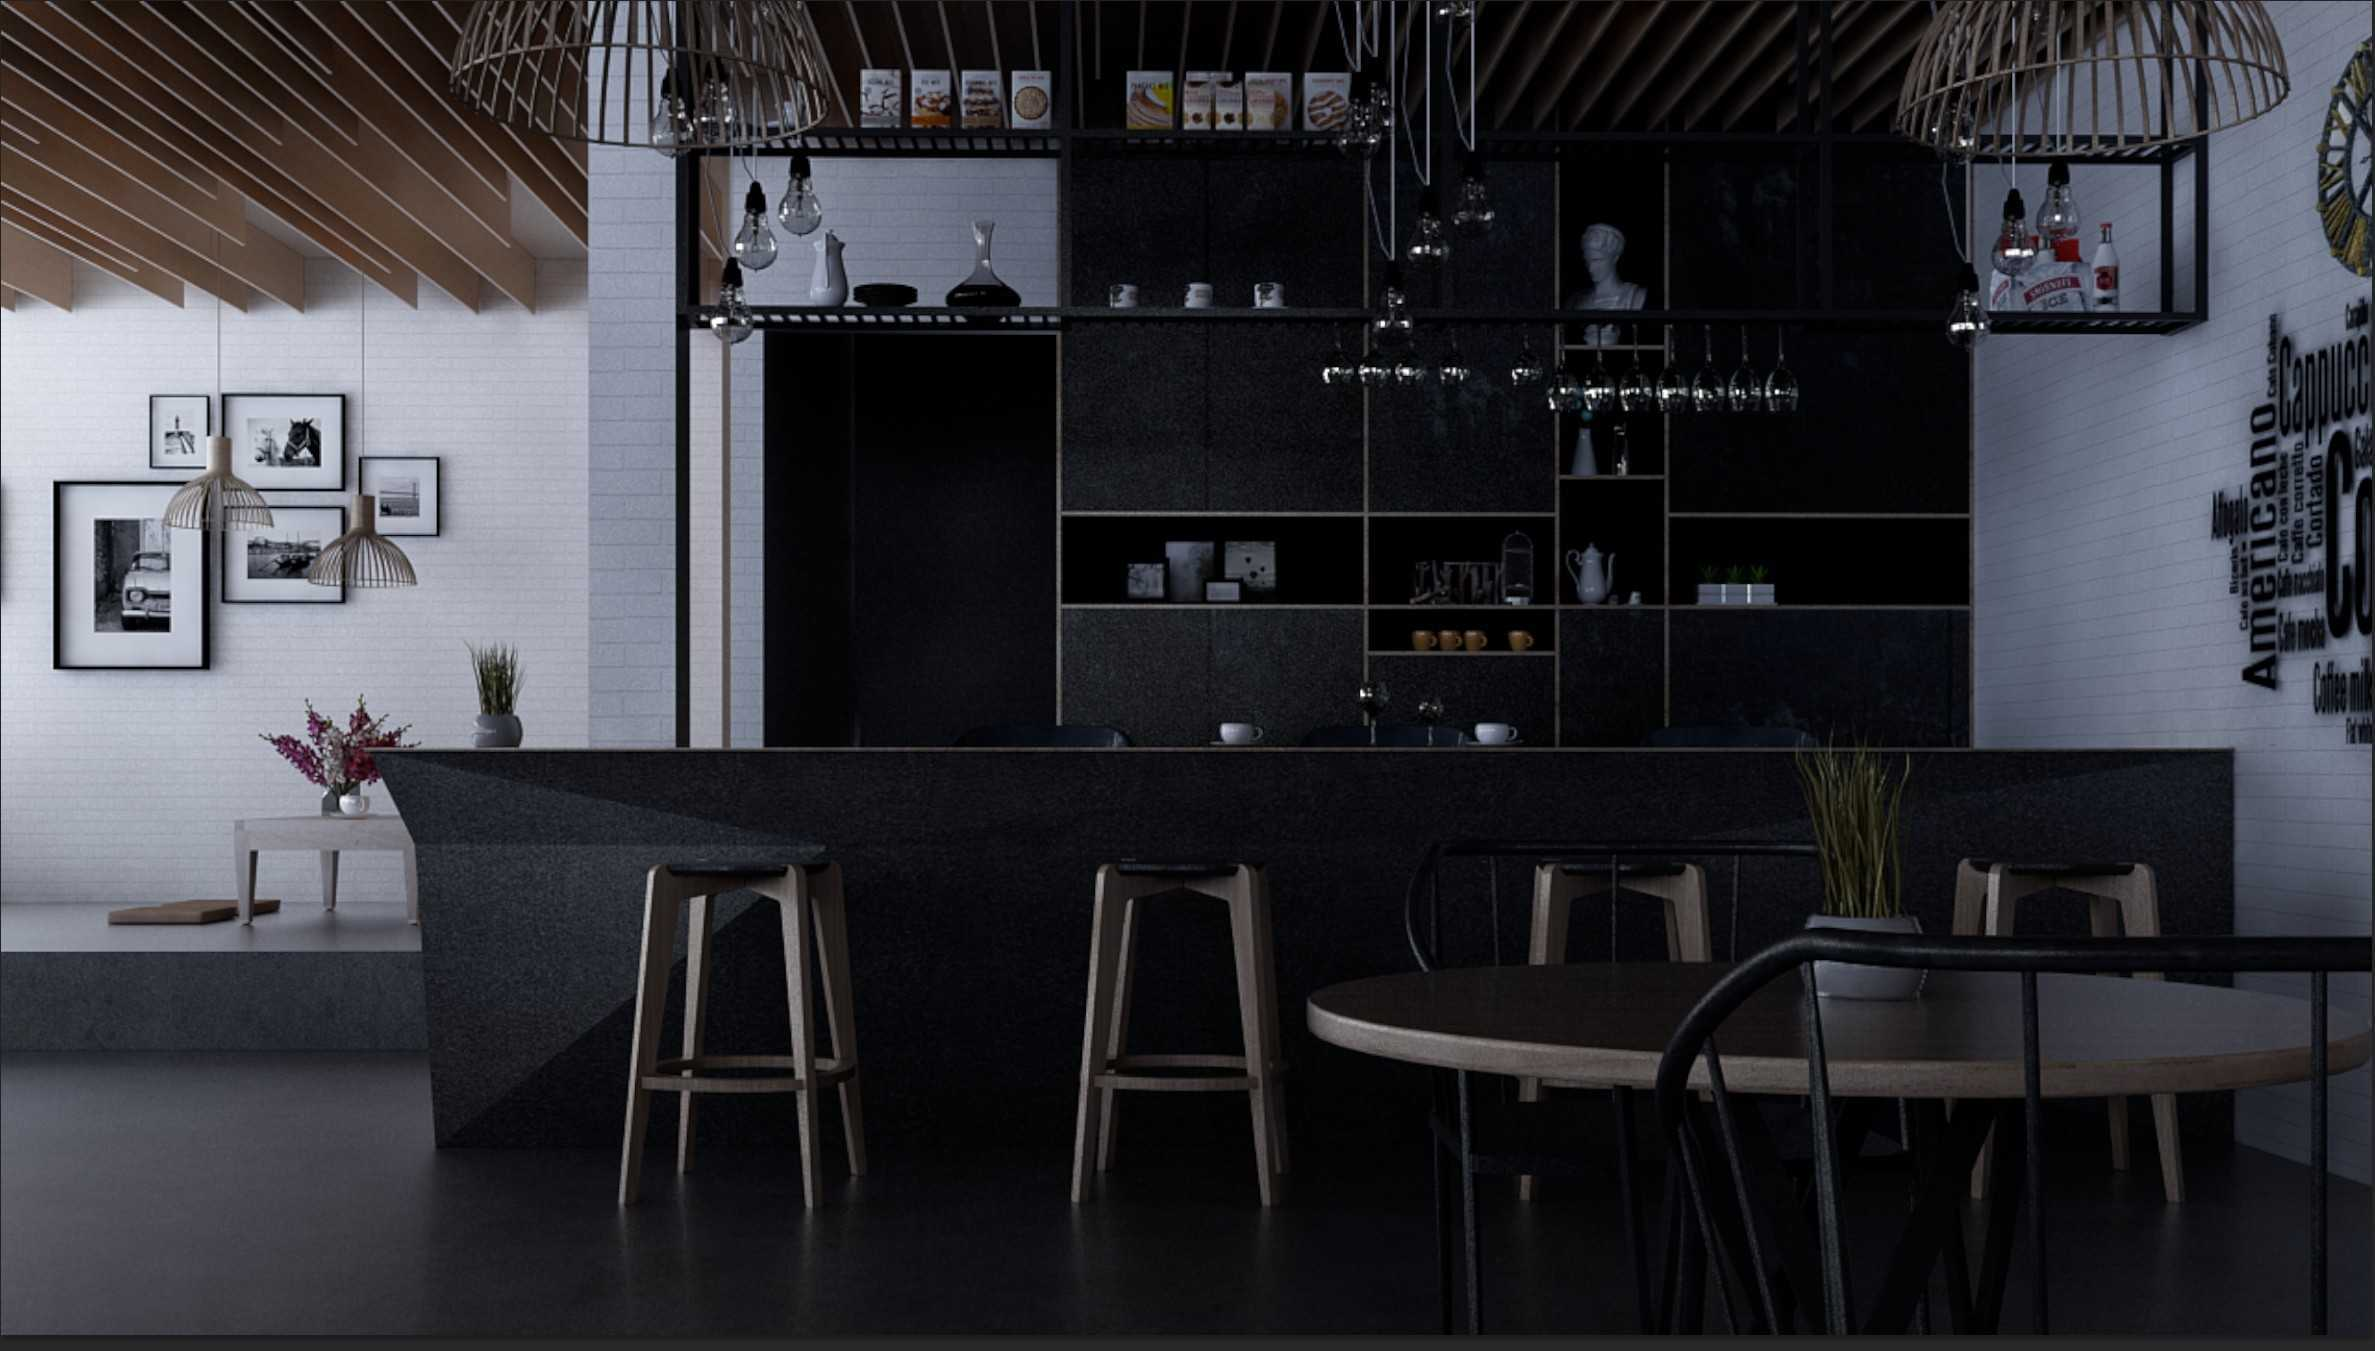 Jr Design Coffee Shop Medan, Medan City, North Sumatra, Indonesia Medan, Medan City, North Sumatra, Indonesia Img0531 Industrial  32080